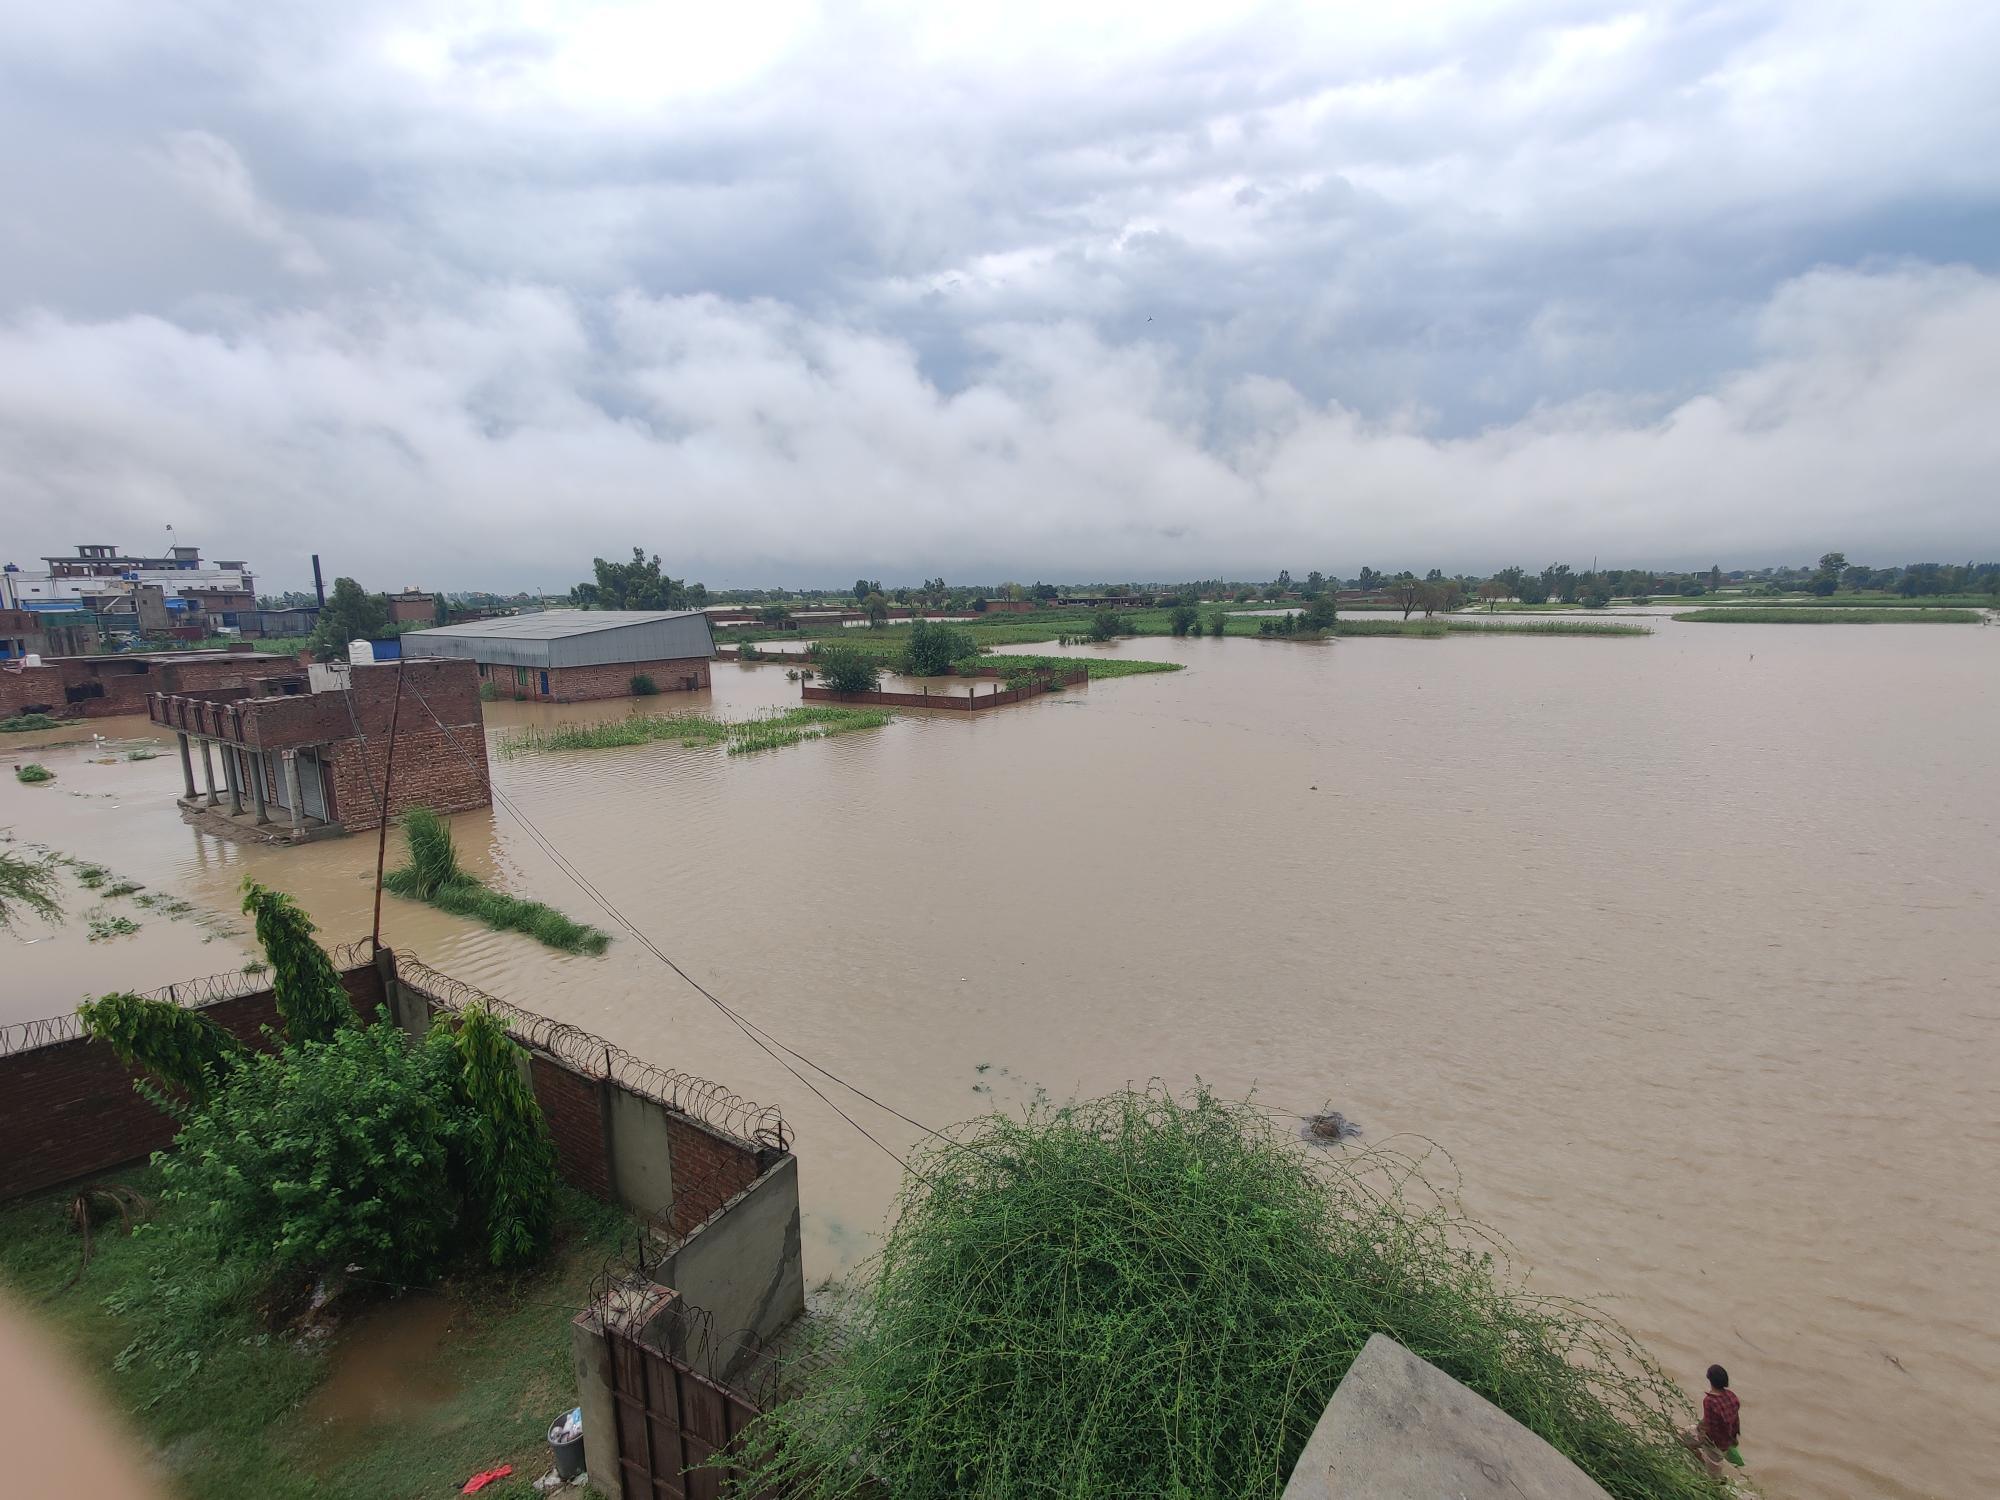 Flooding kills 20 in Pakistan